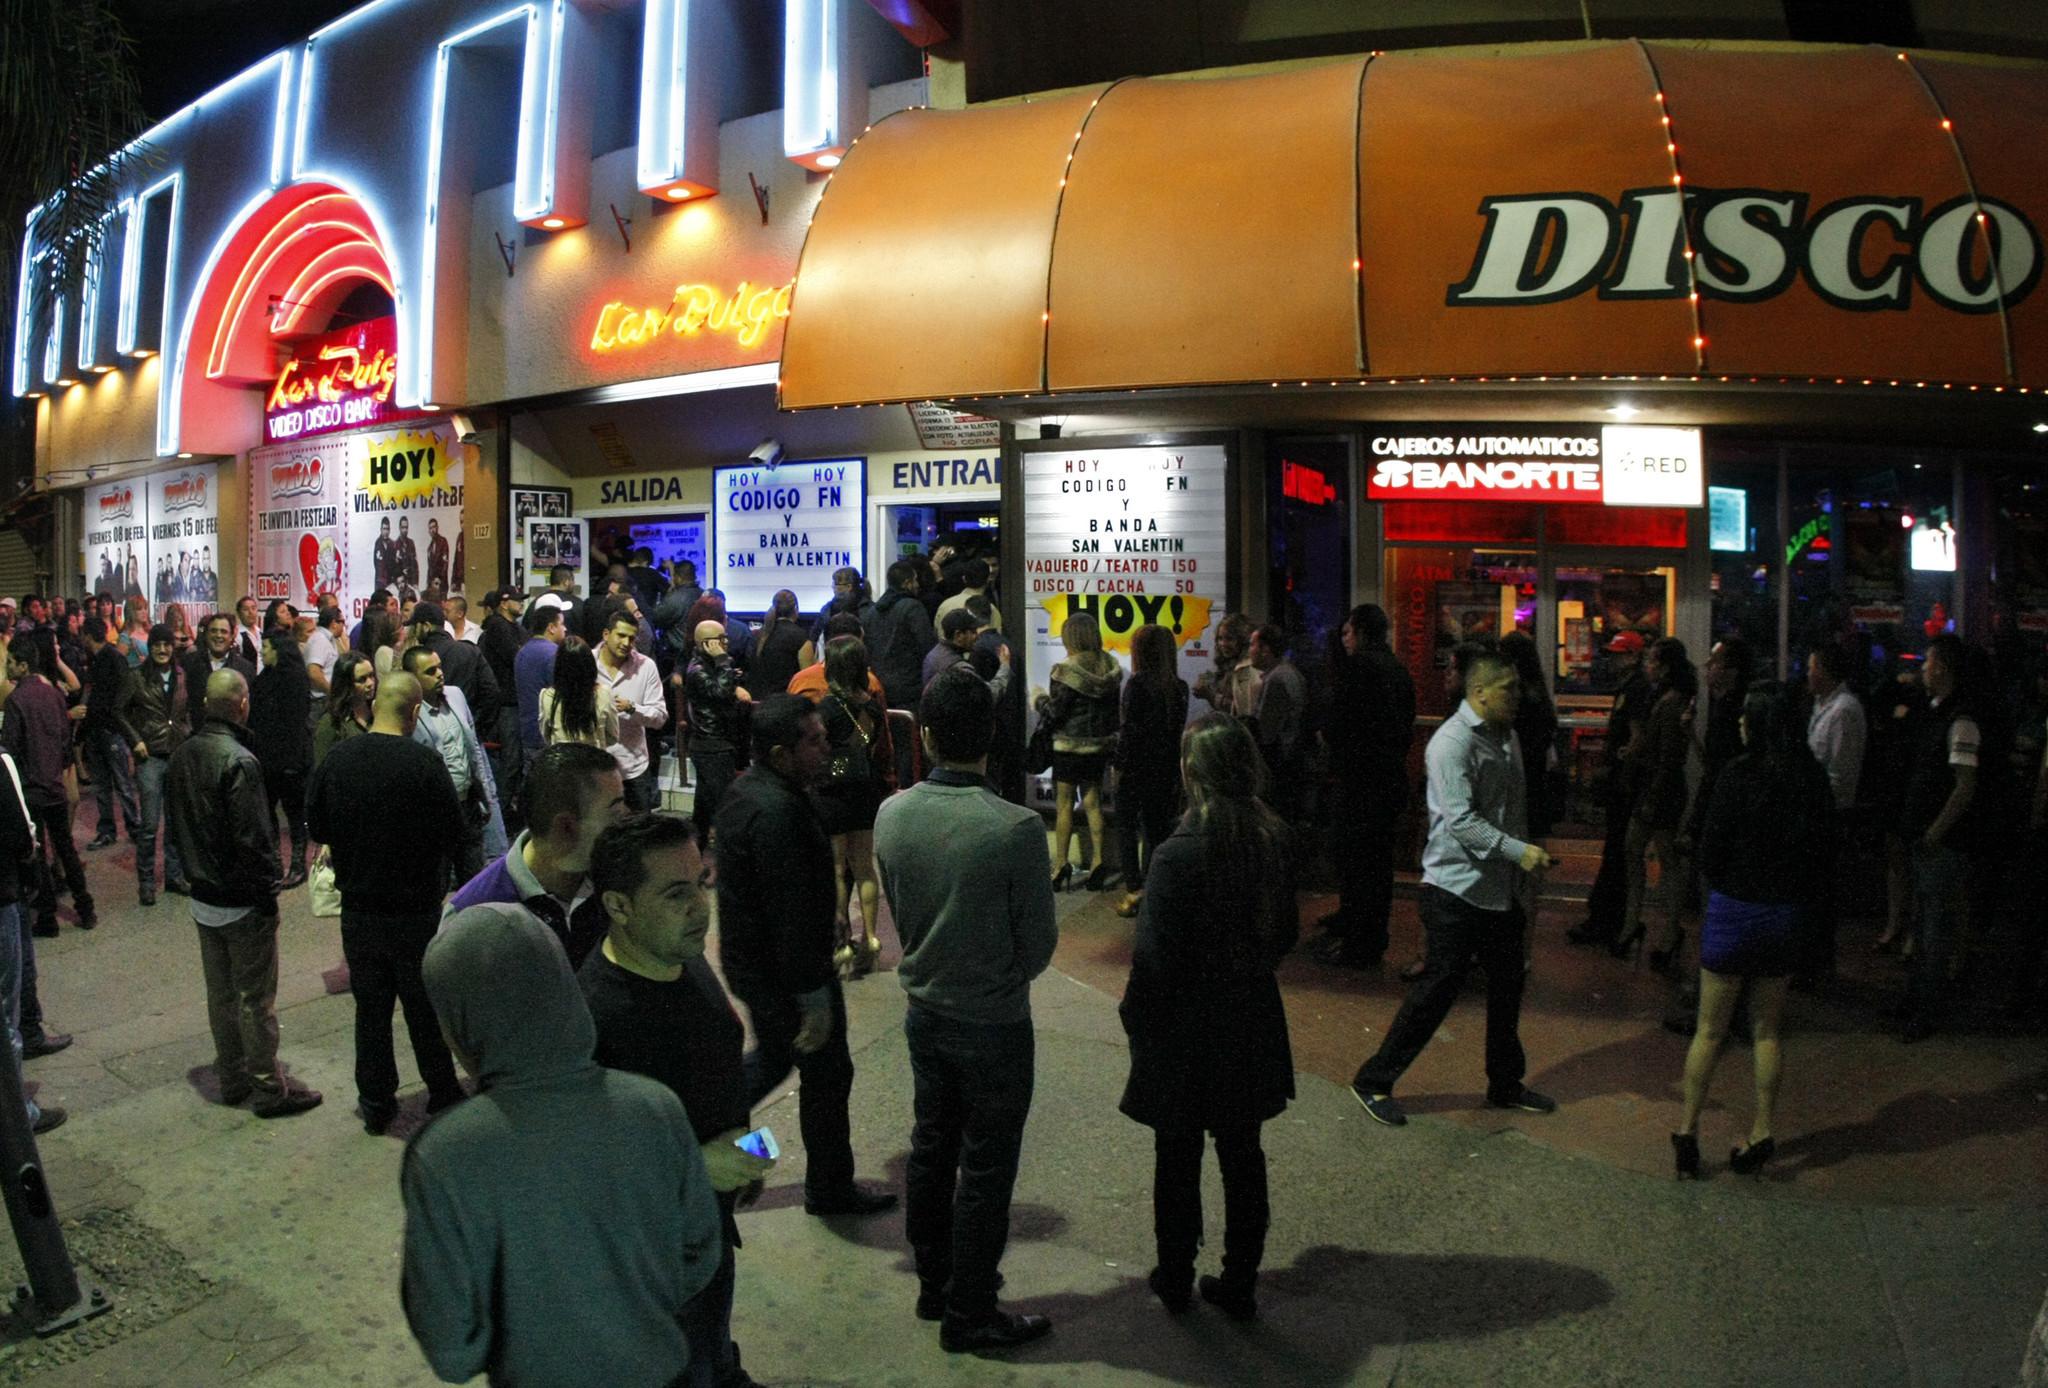 Tijuanas night life springs back into action - LA Times